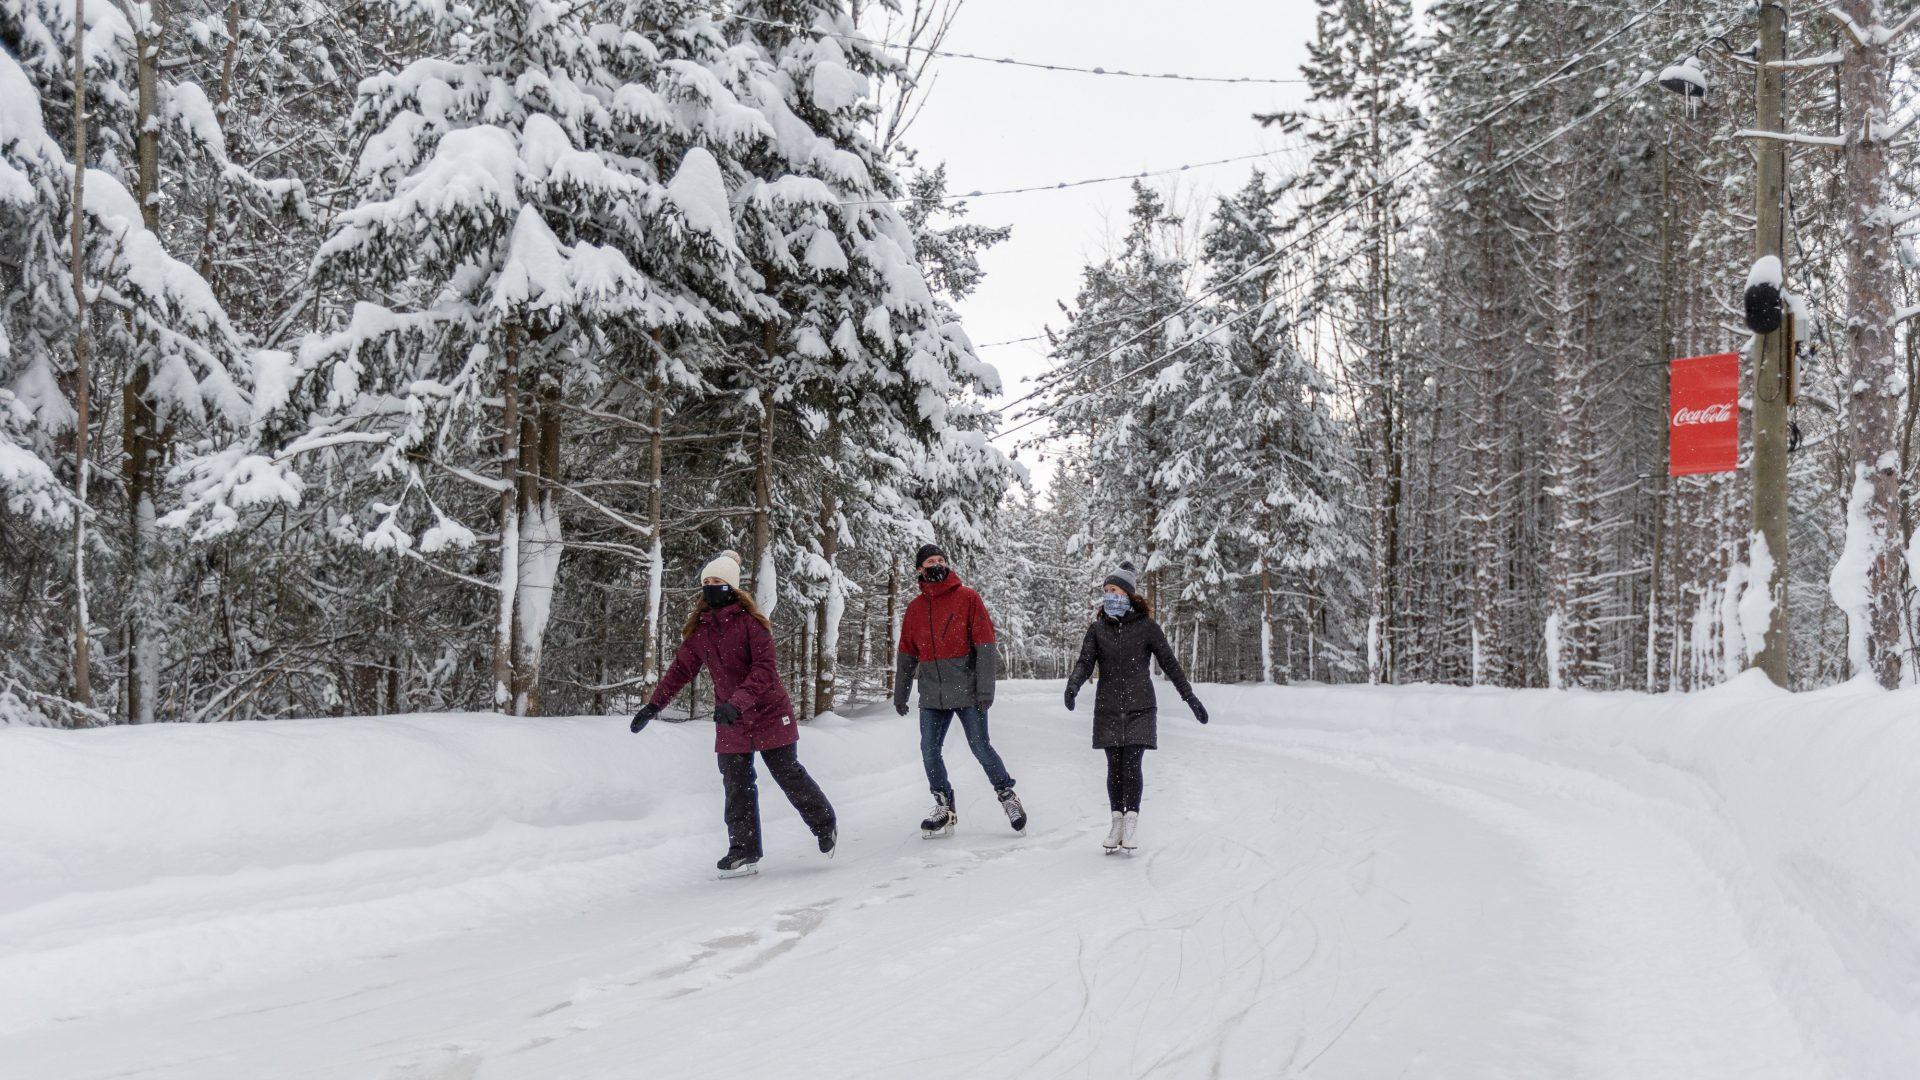 You can skate on a magical mountaintop this winter (PHOTOS)